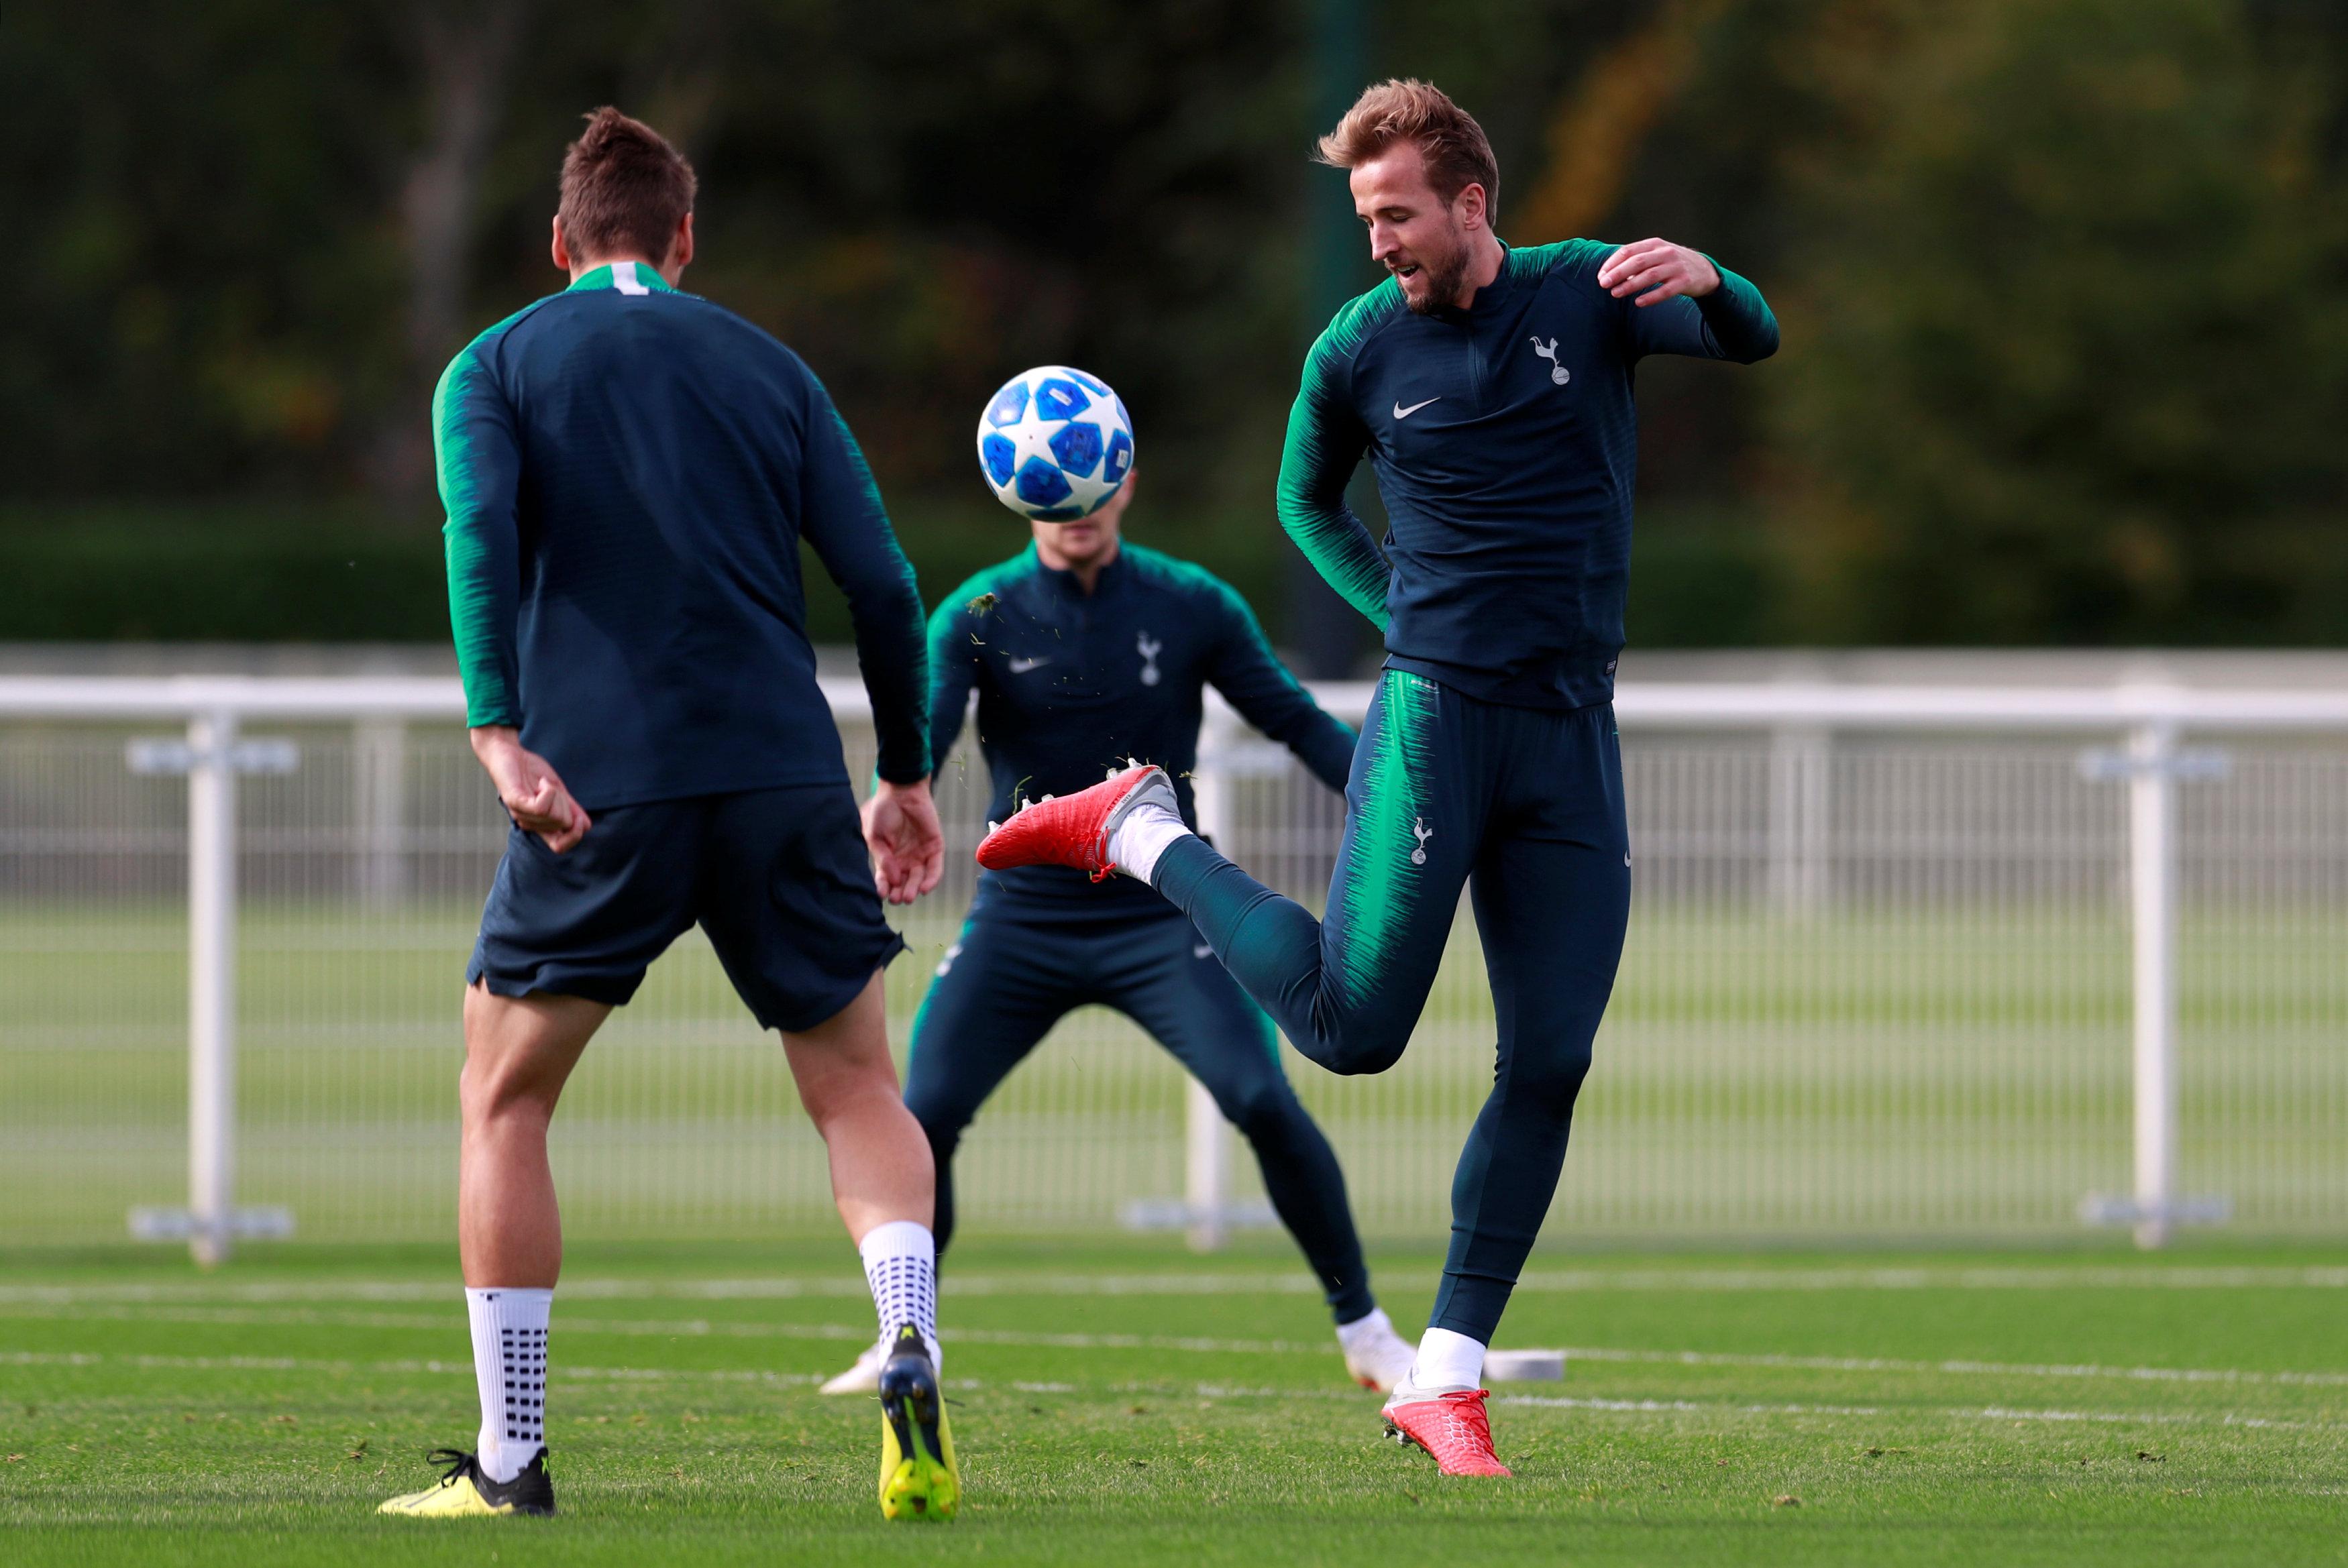 Football: Be optimistic, Pochettino urges depleted Spurs ahead of Barca clash